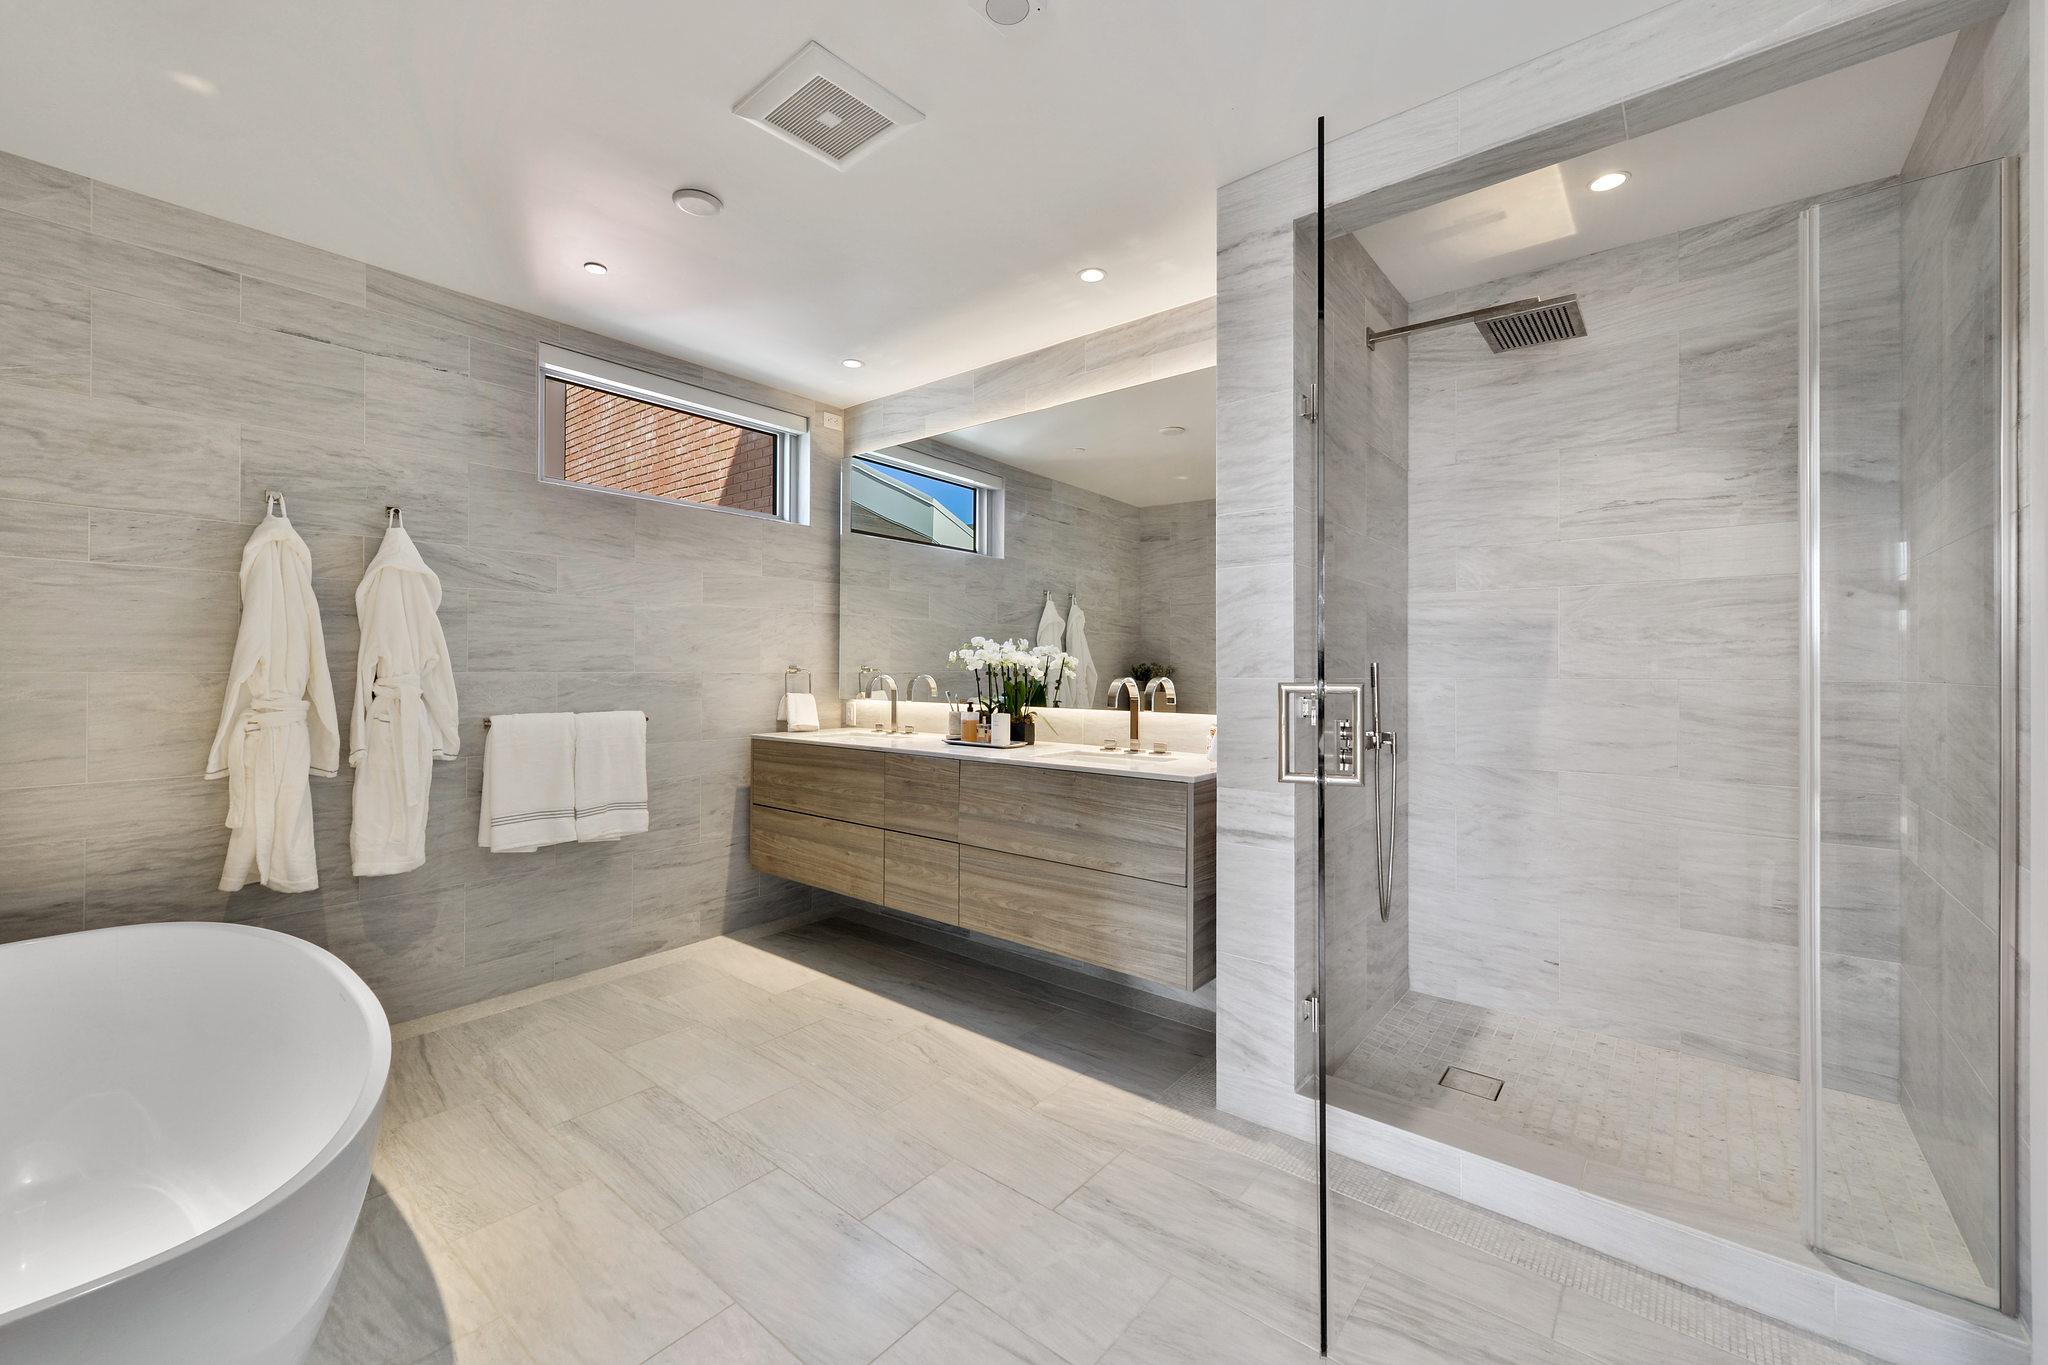 Bay Area Homes for Sale - Bathroom